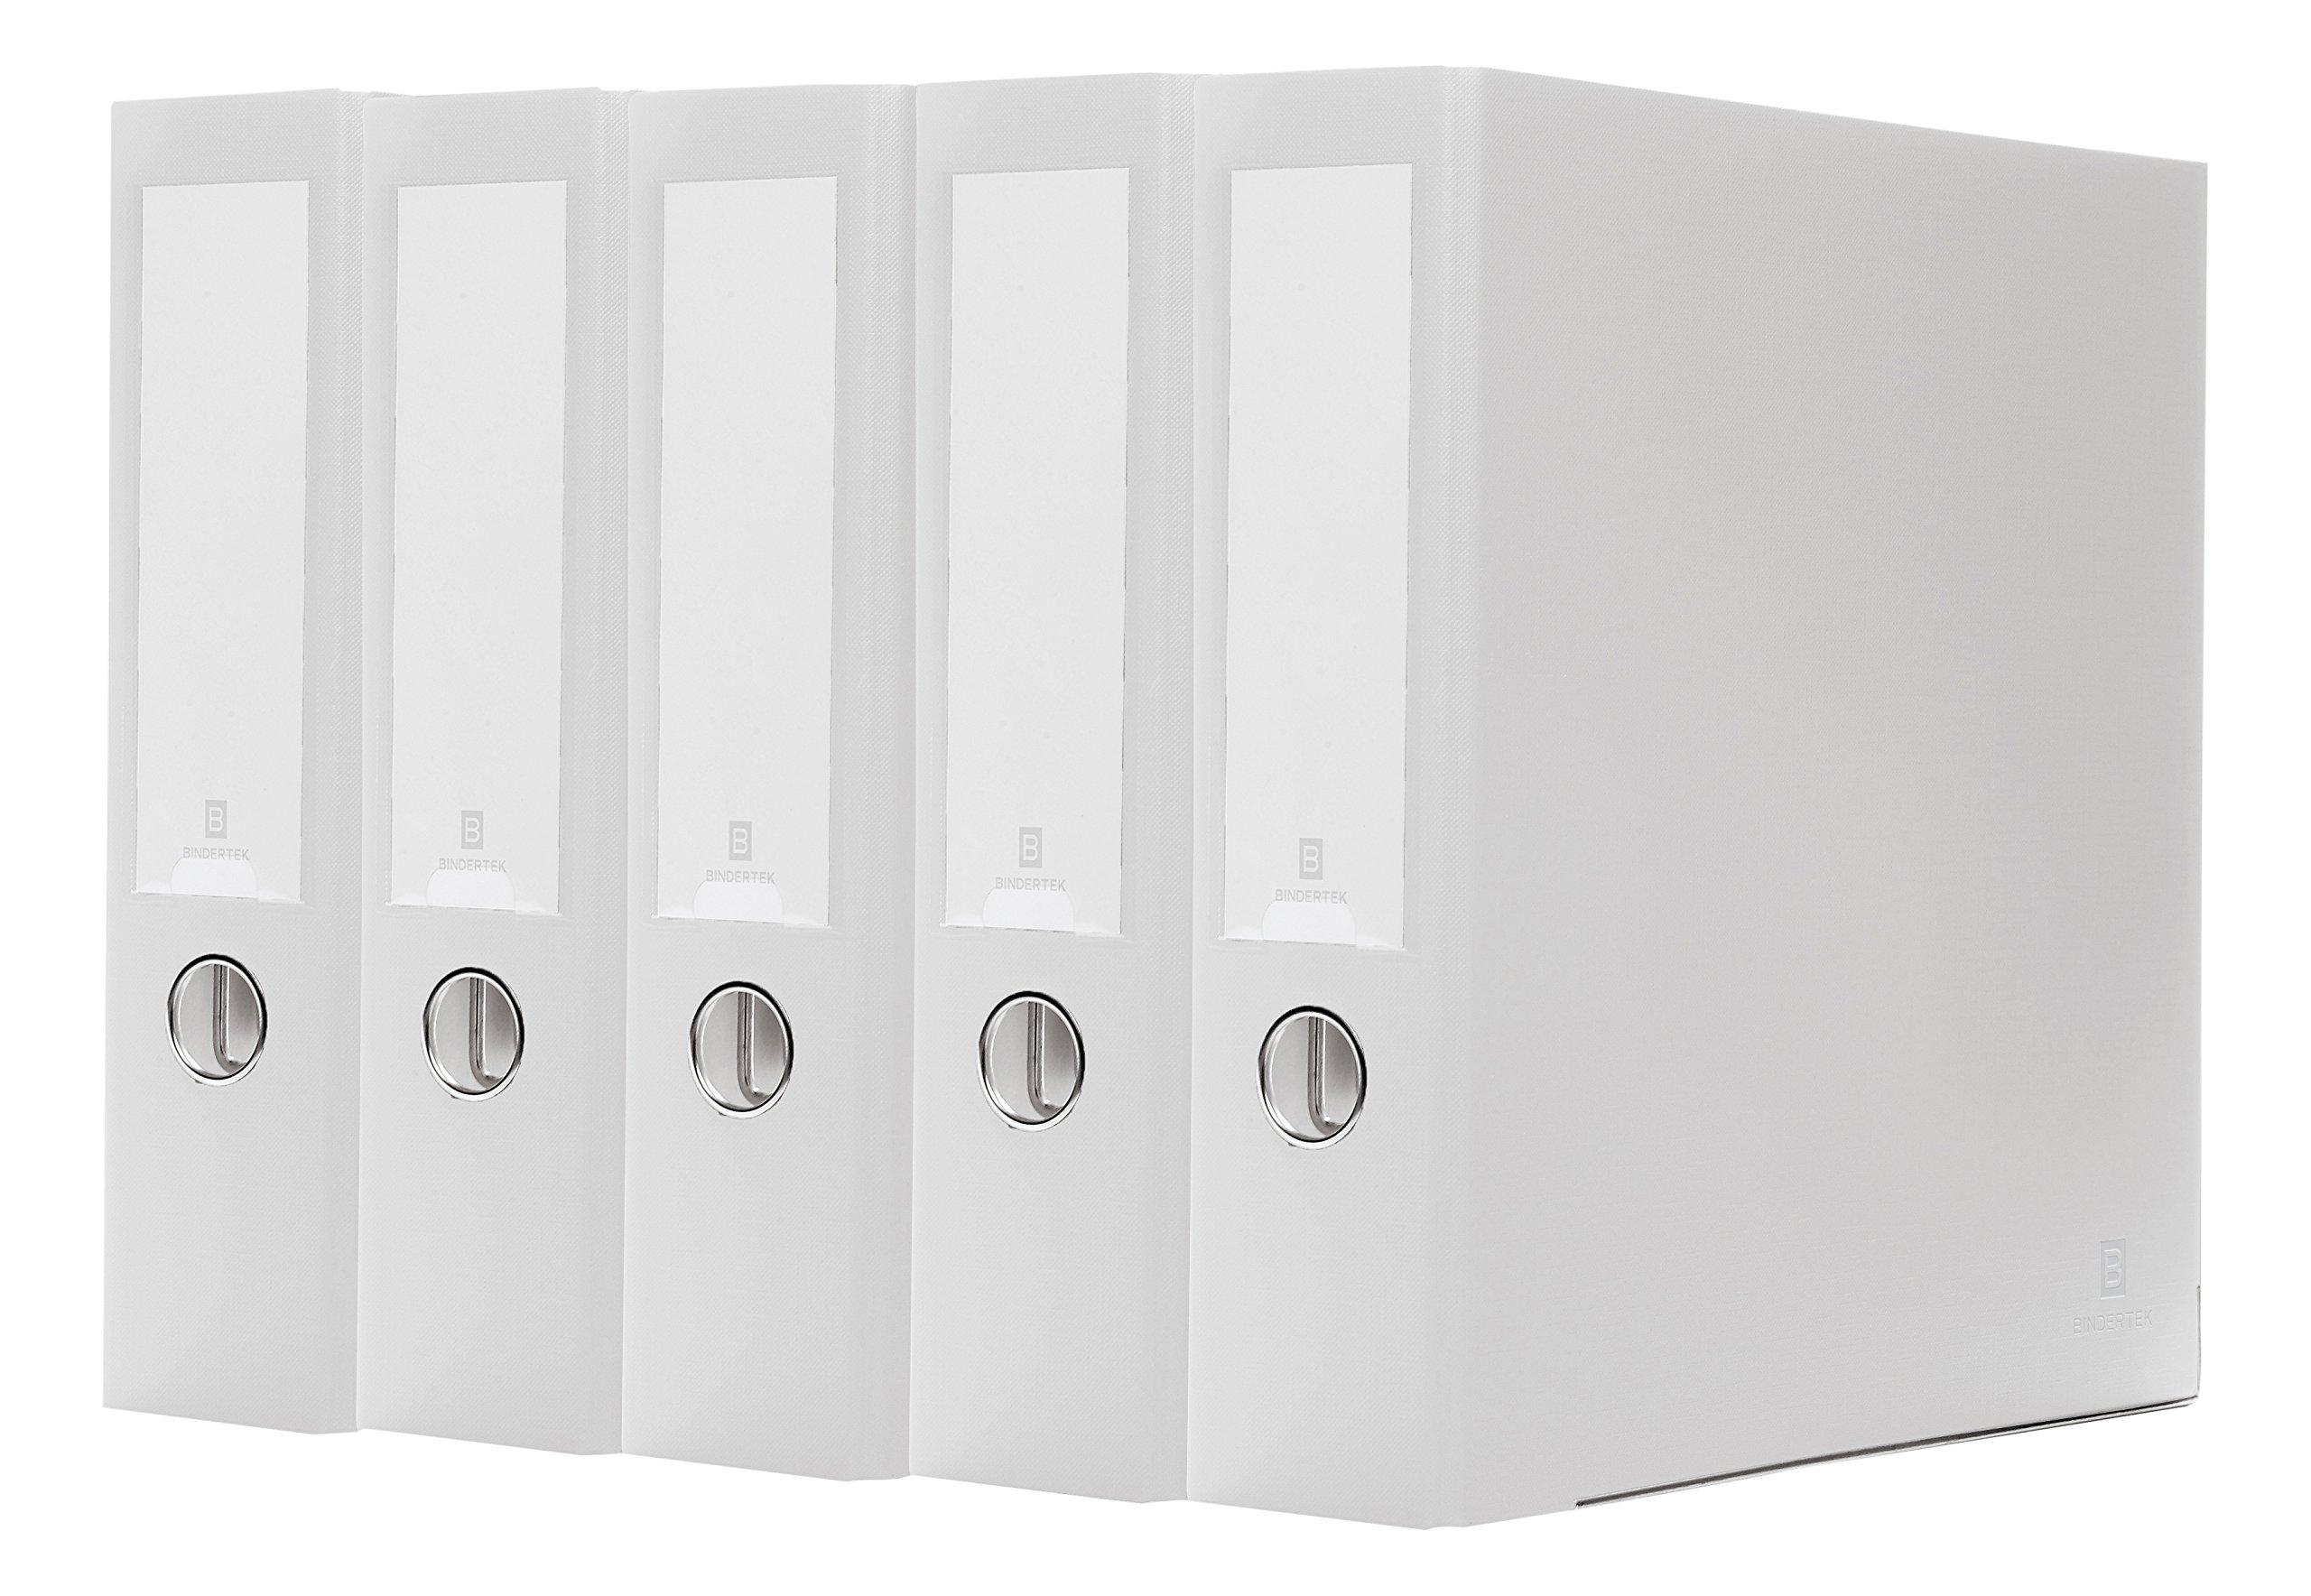 Bindertek 3-Ring 3-Inch Premium Linen Textured Binder 5-Pack, White (3EFPACK-WH)